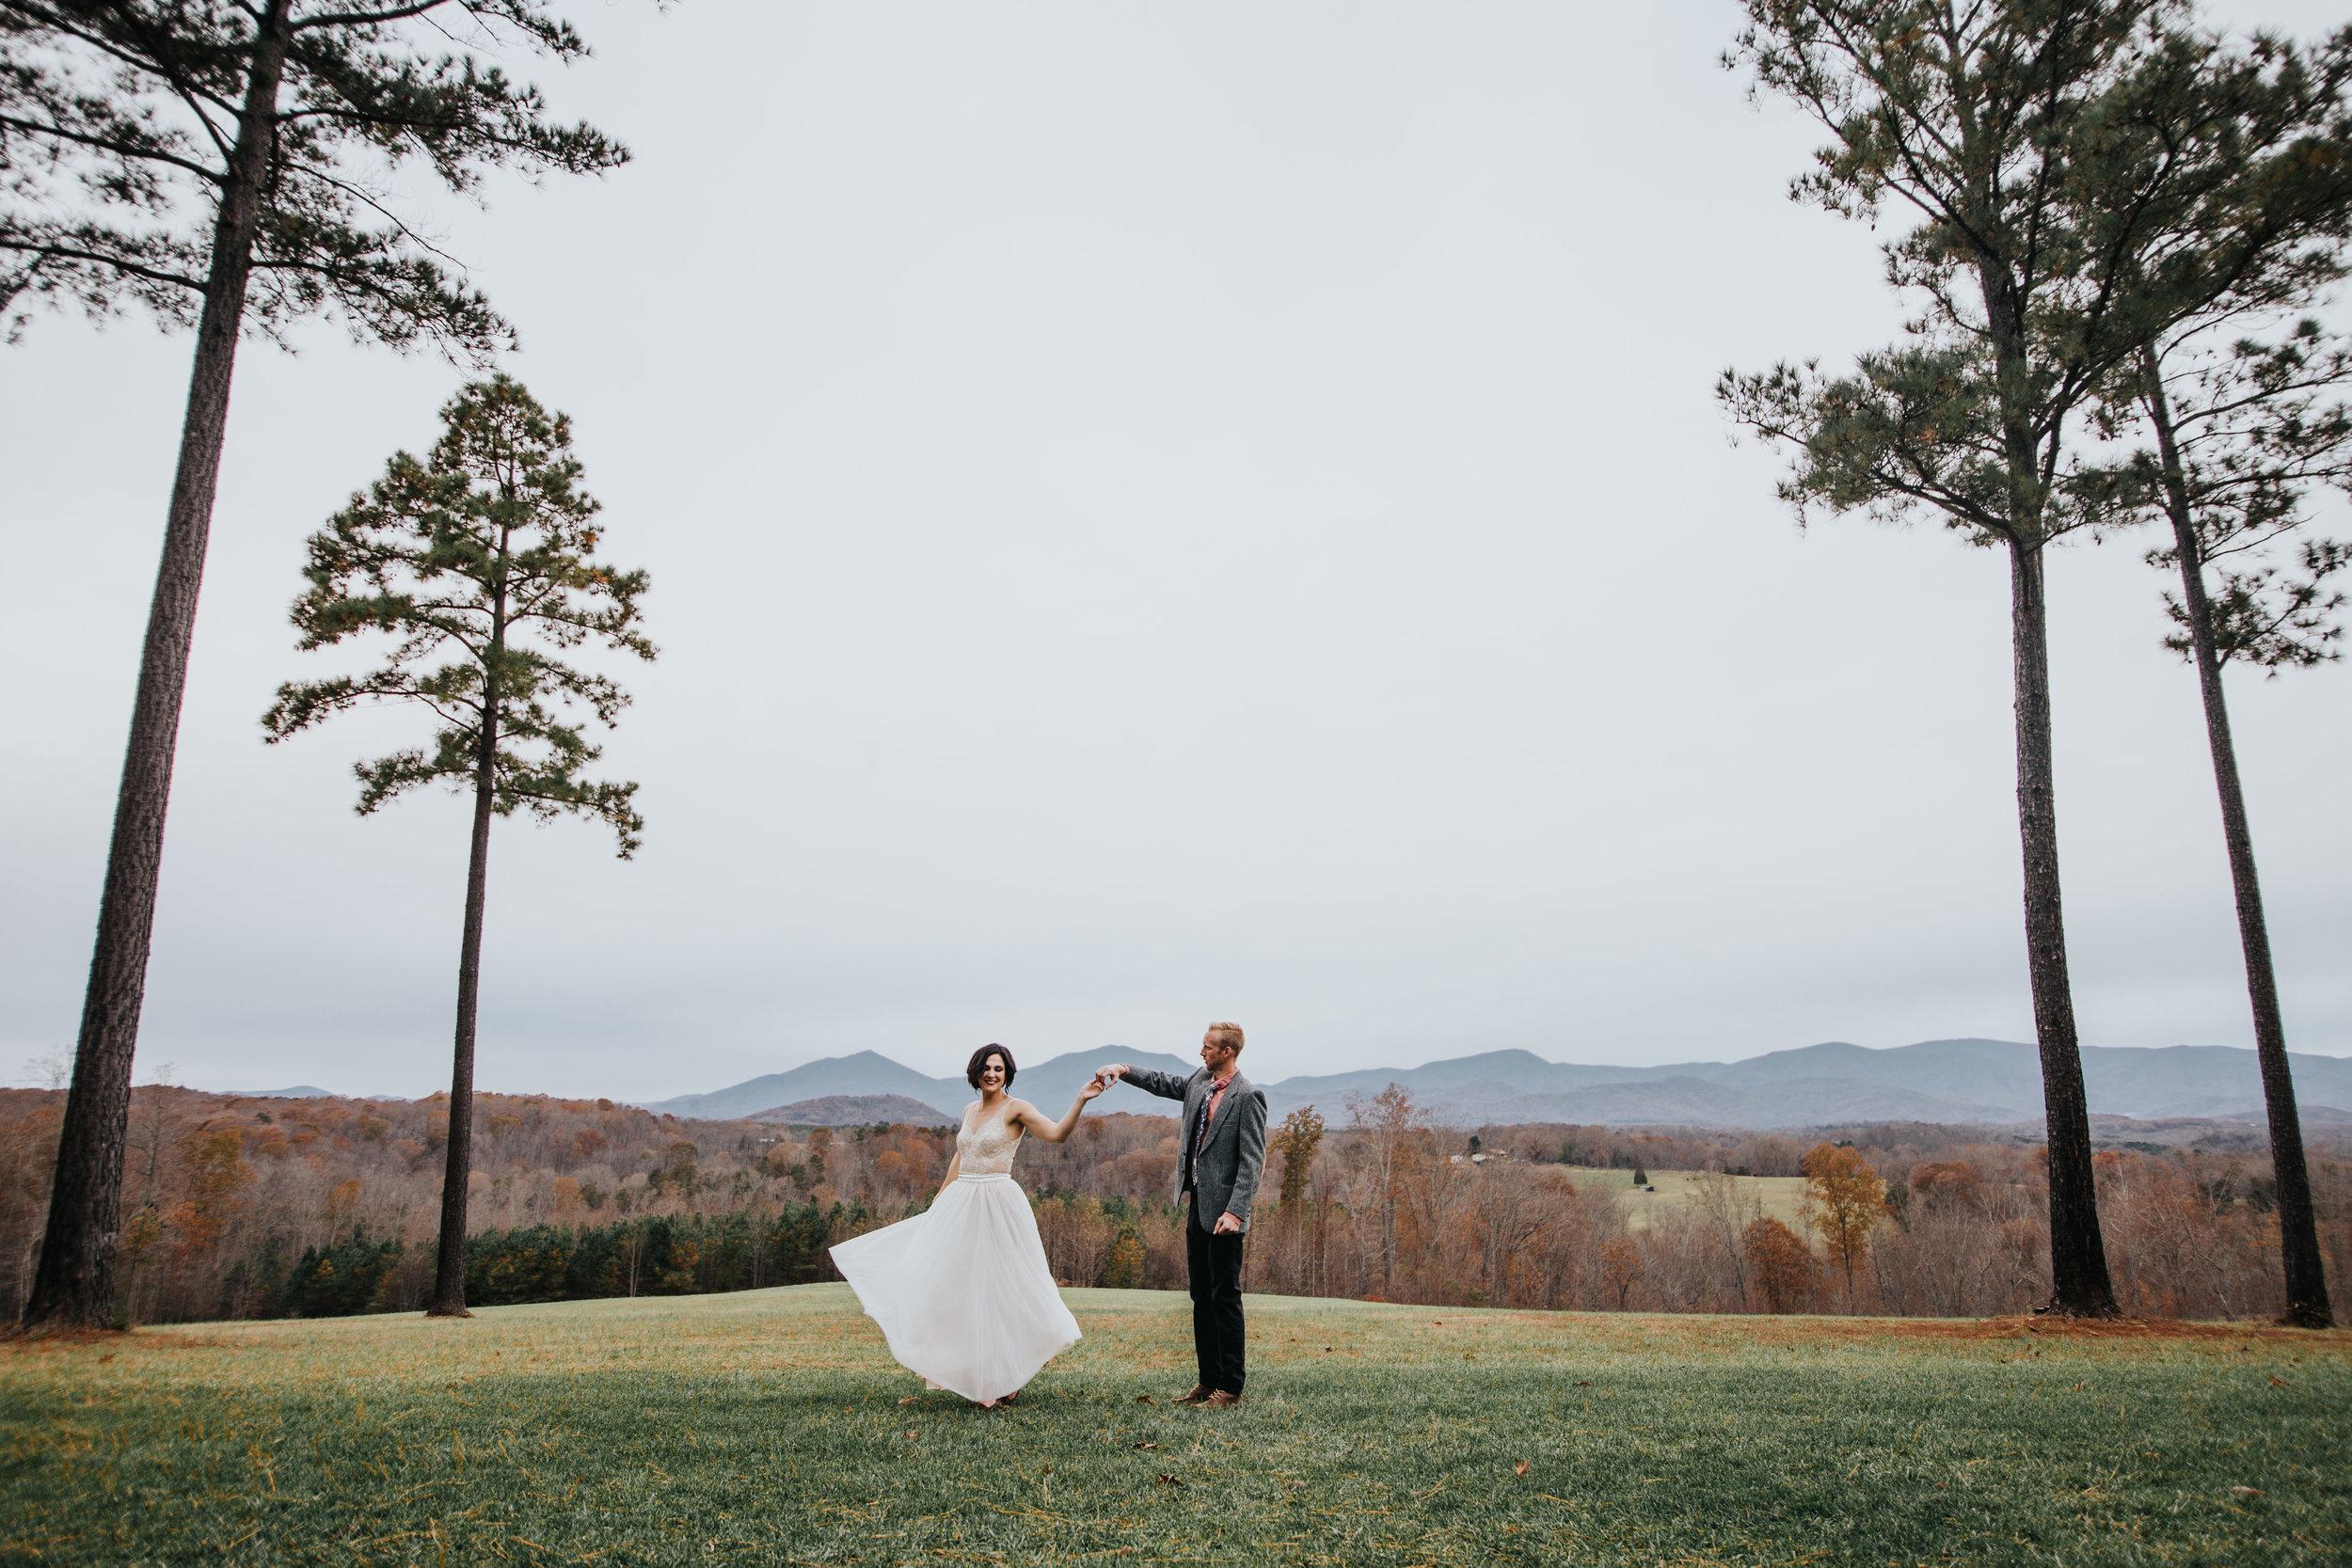 Lauren & Greg - Sierra Vista - Amative Creative-59.jpg